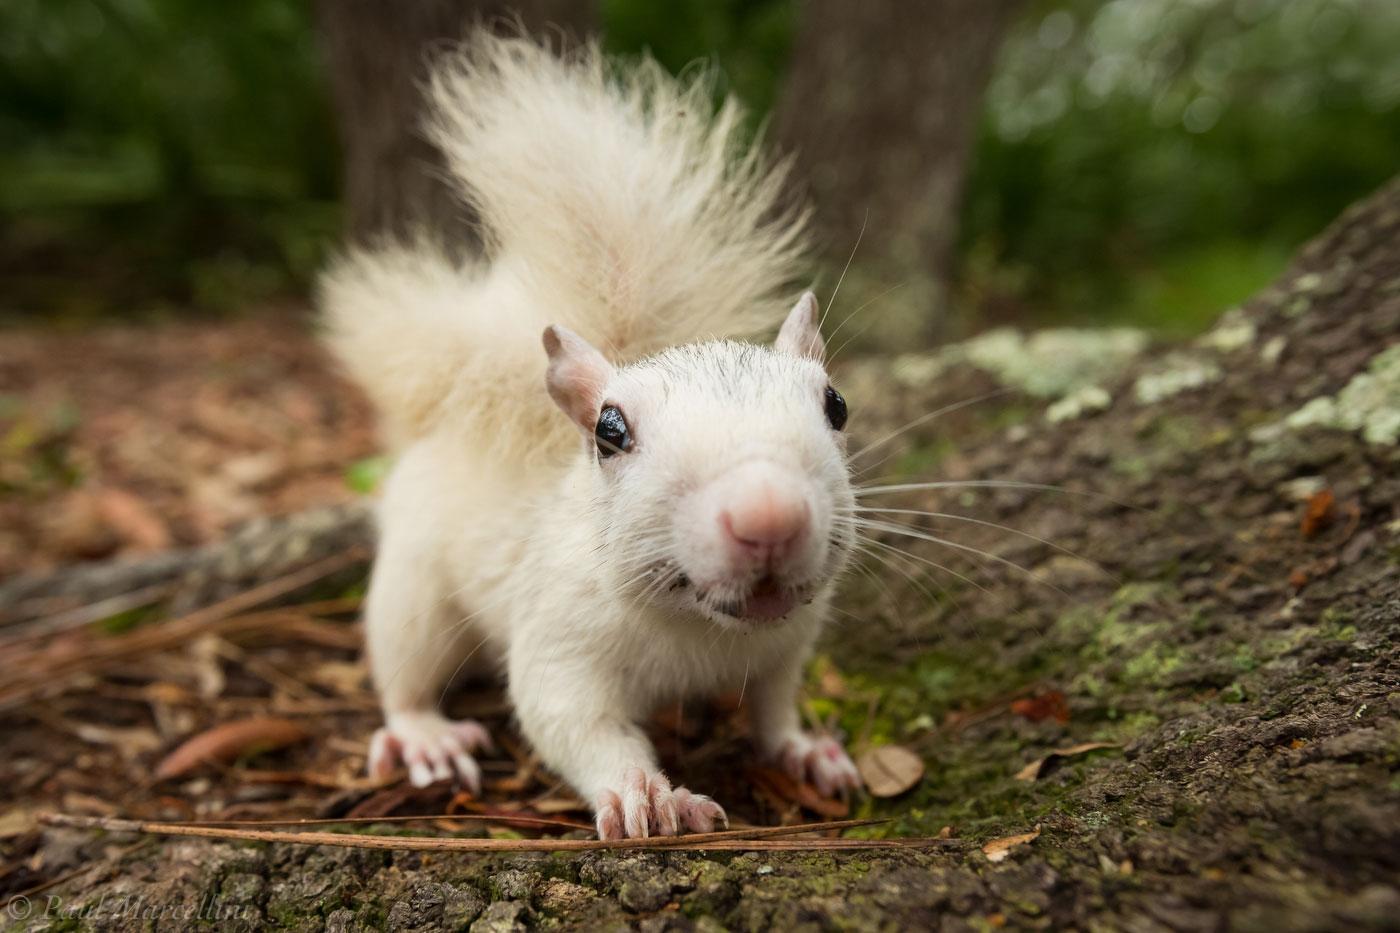 Sciurus carolinensis, white squirrel, Ochlockonee River State Park, Florida, photo